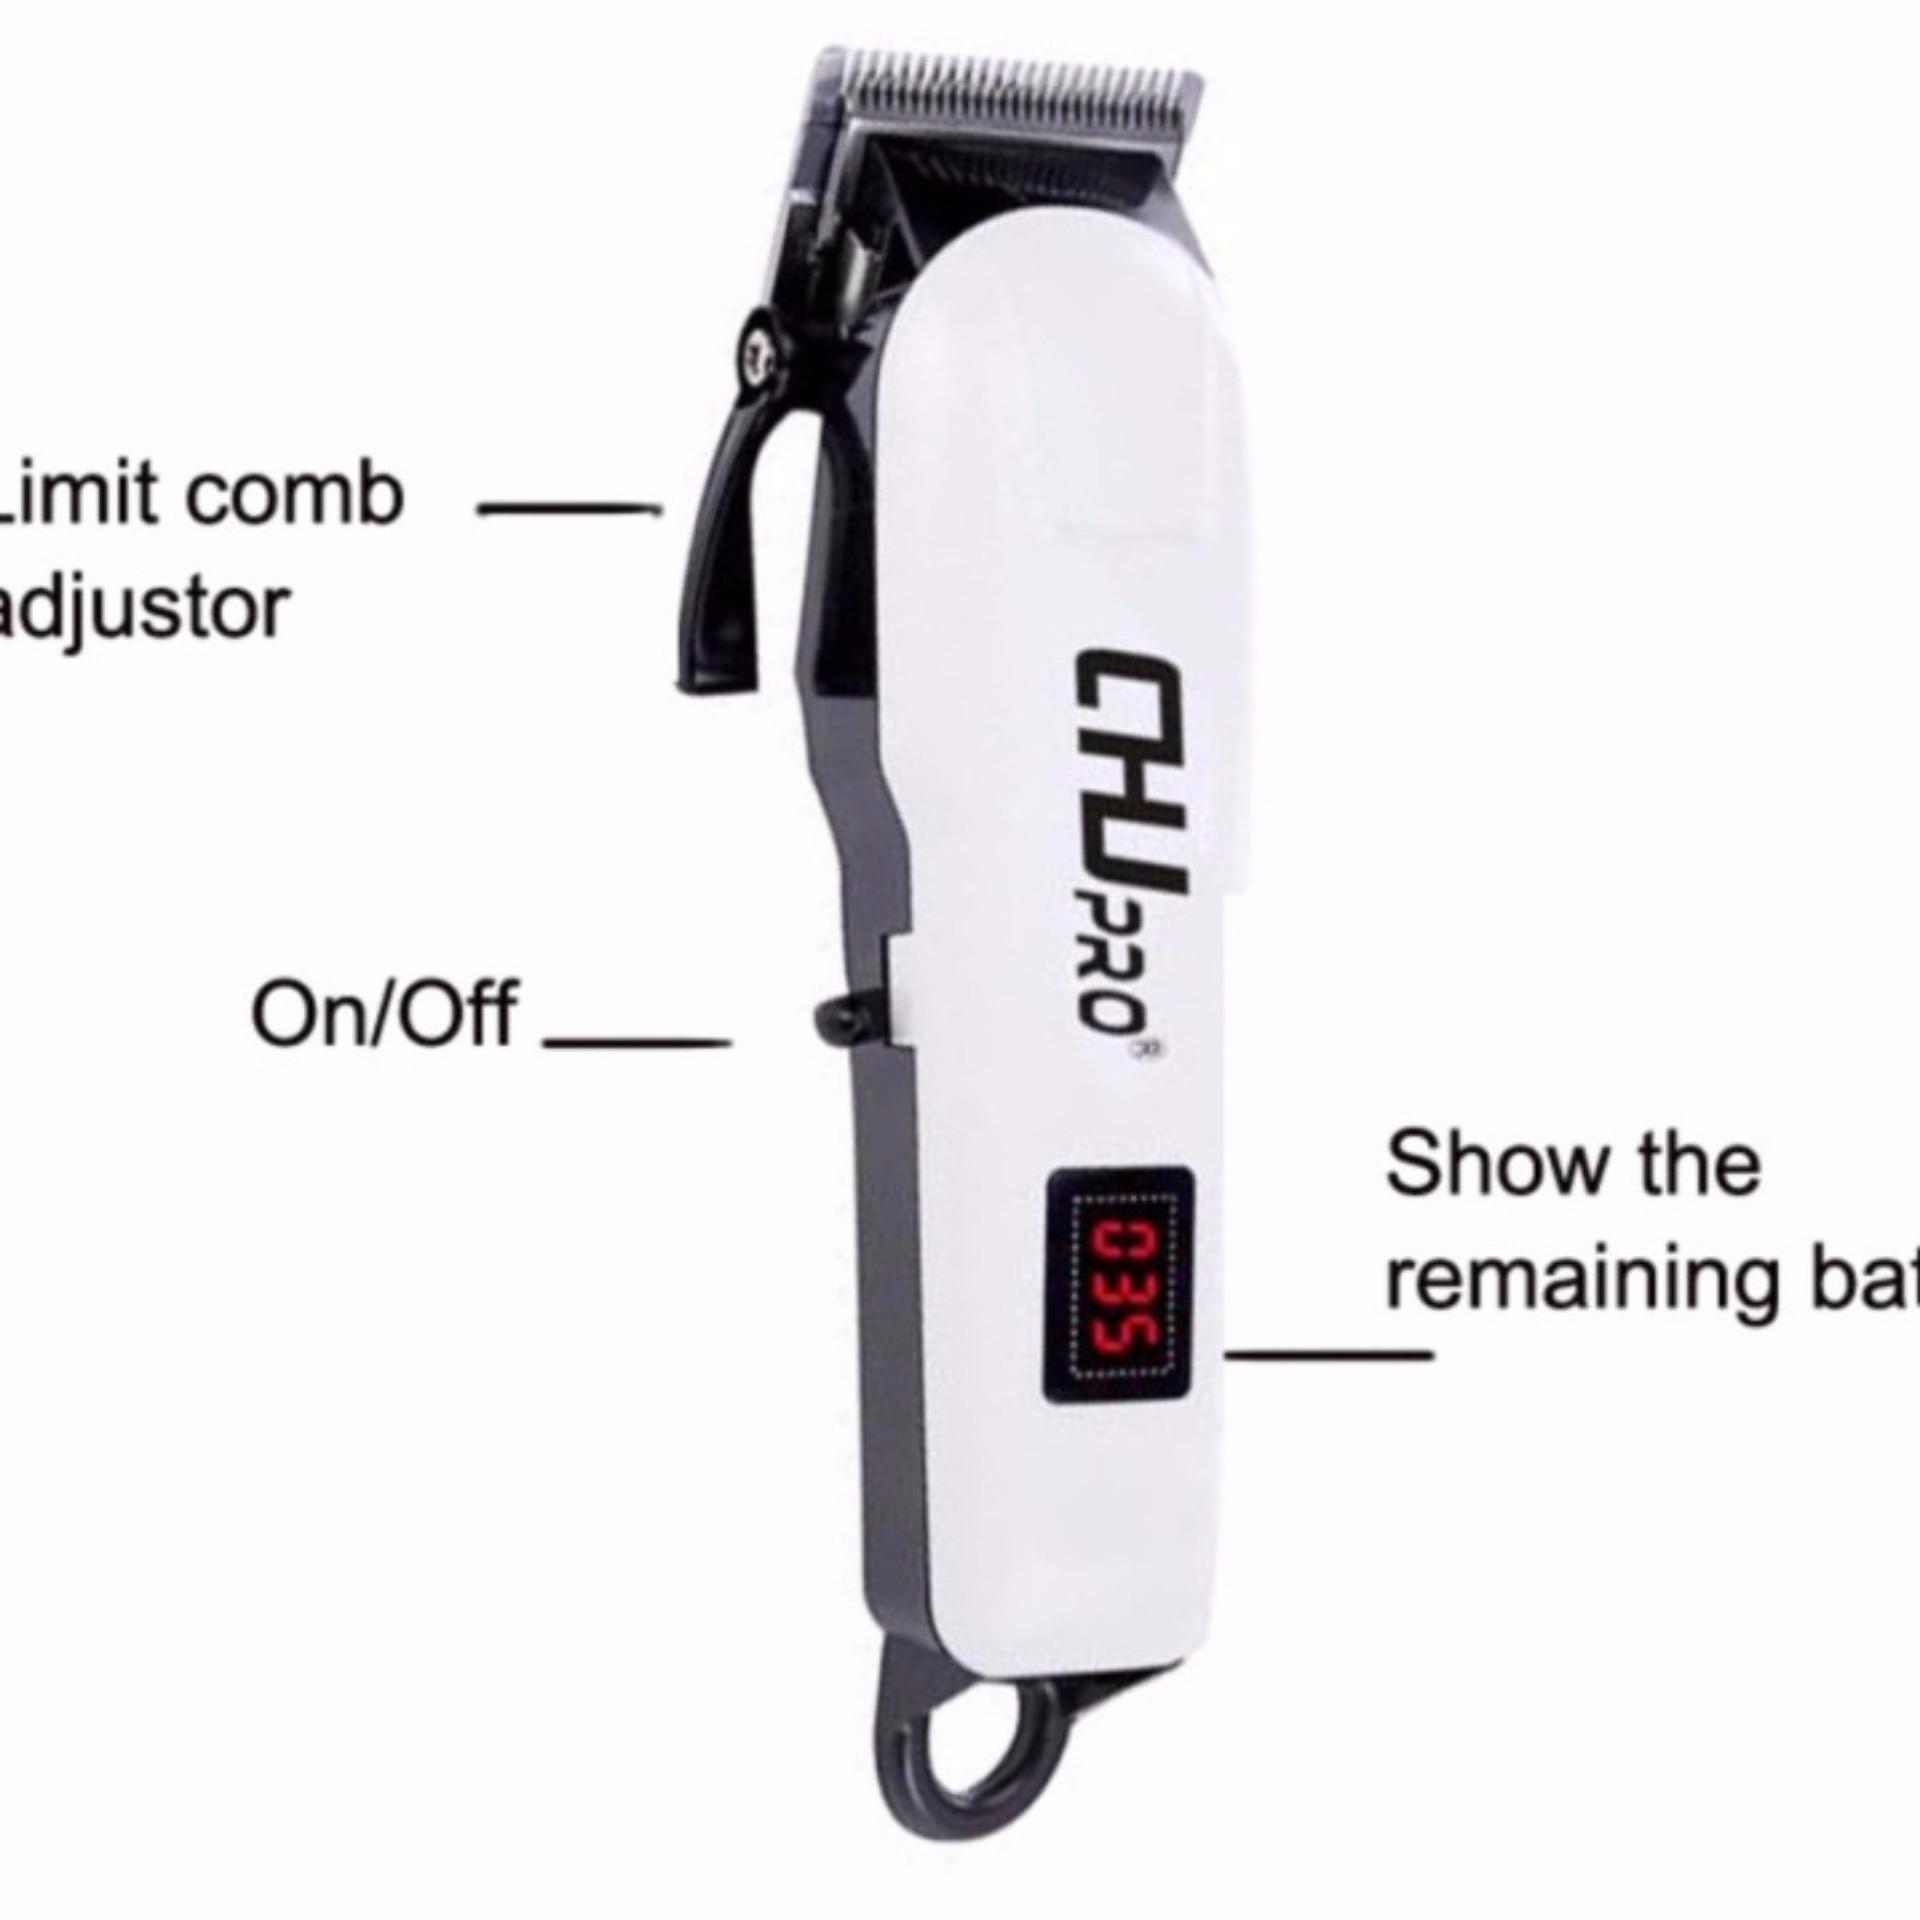 Jual Hair Clipper Superior Taper Rfcd Chj Pro 908 Mesin Cukur Rambut Cordless Satu Set